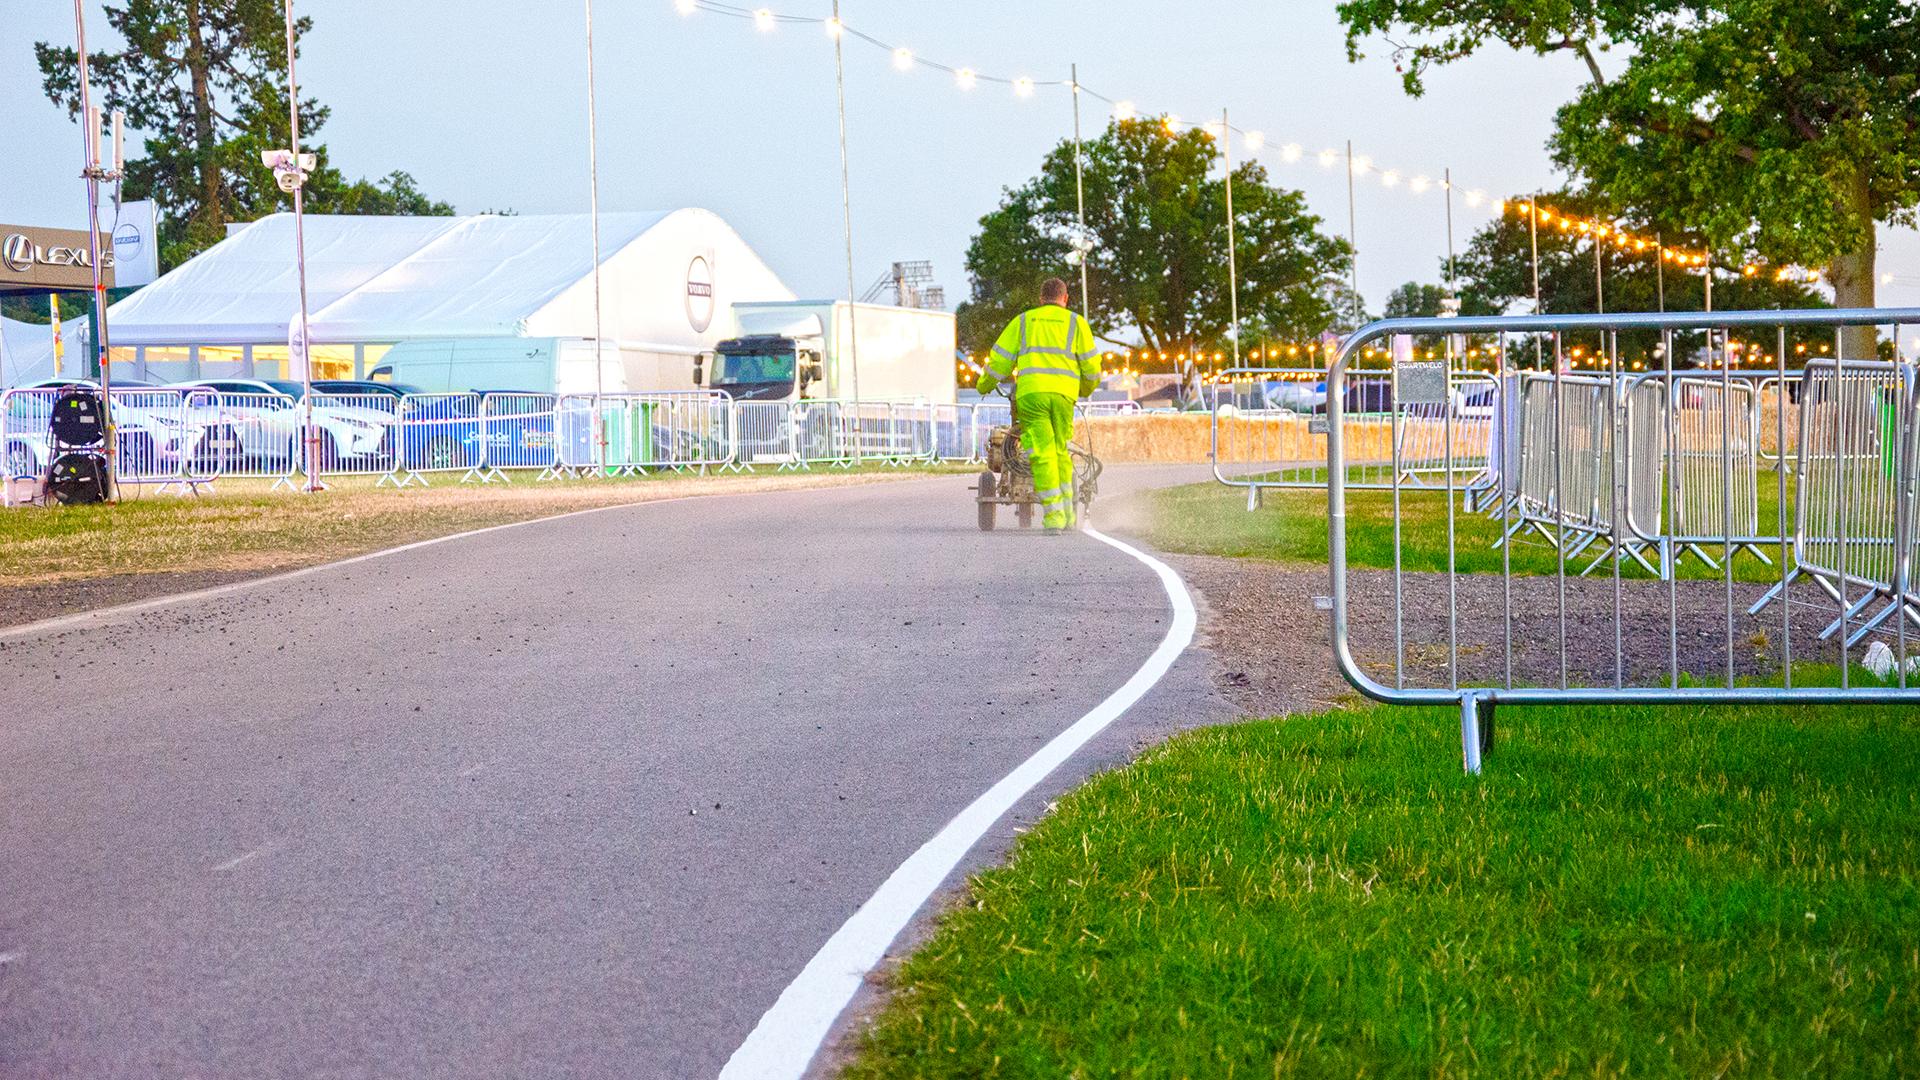 Carfest Road Marking 19